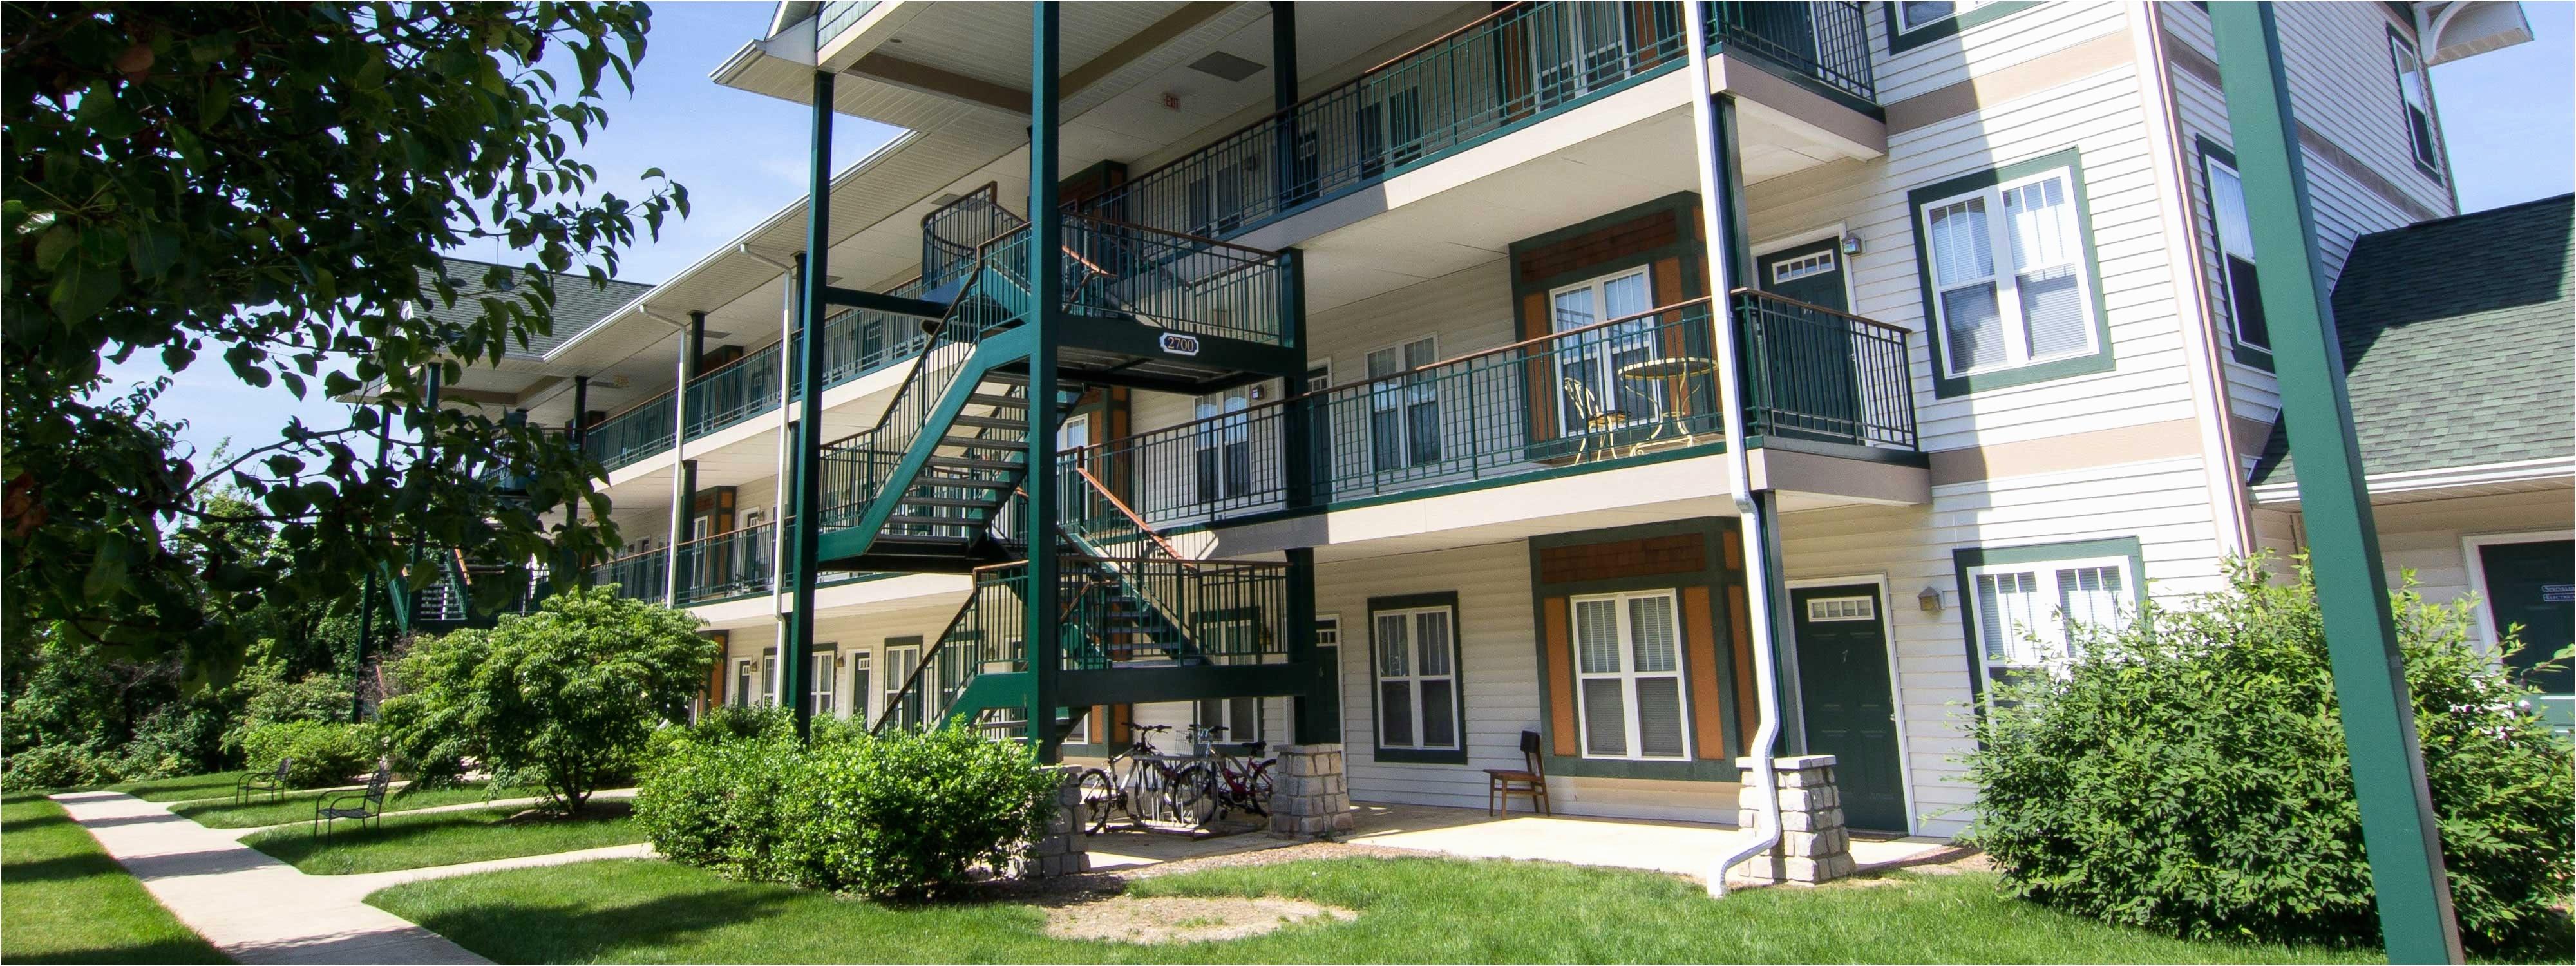 studio 1 bedroom apartments rent beautiful bloomington indiana apartments studios amp 1 to 4 bedroom